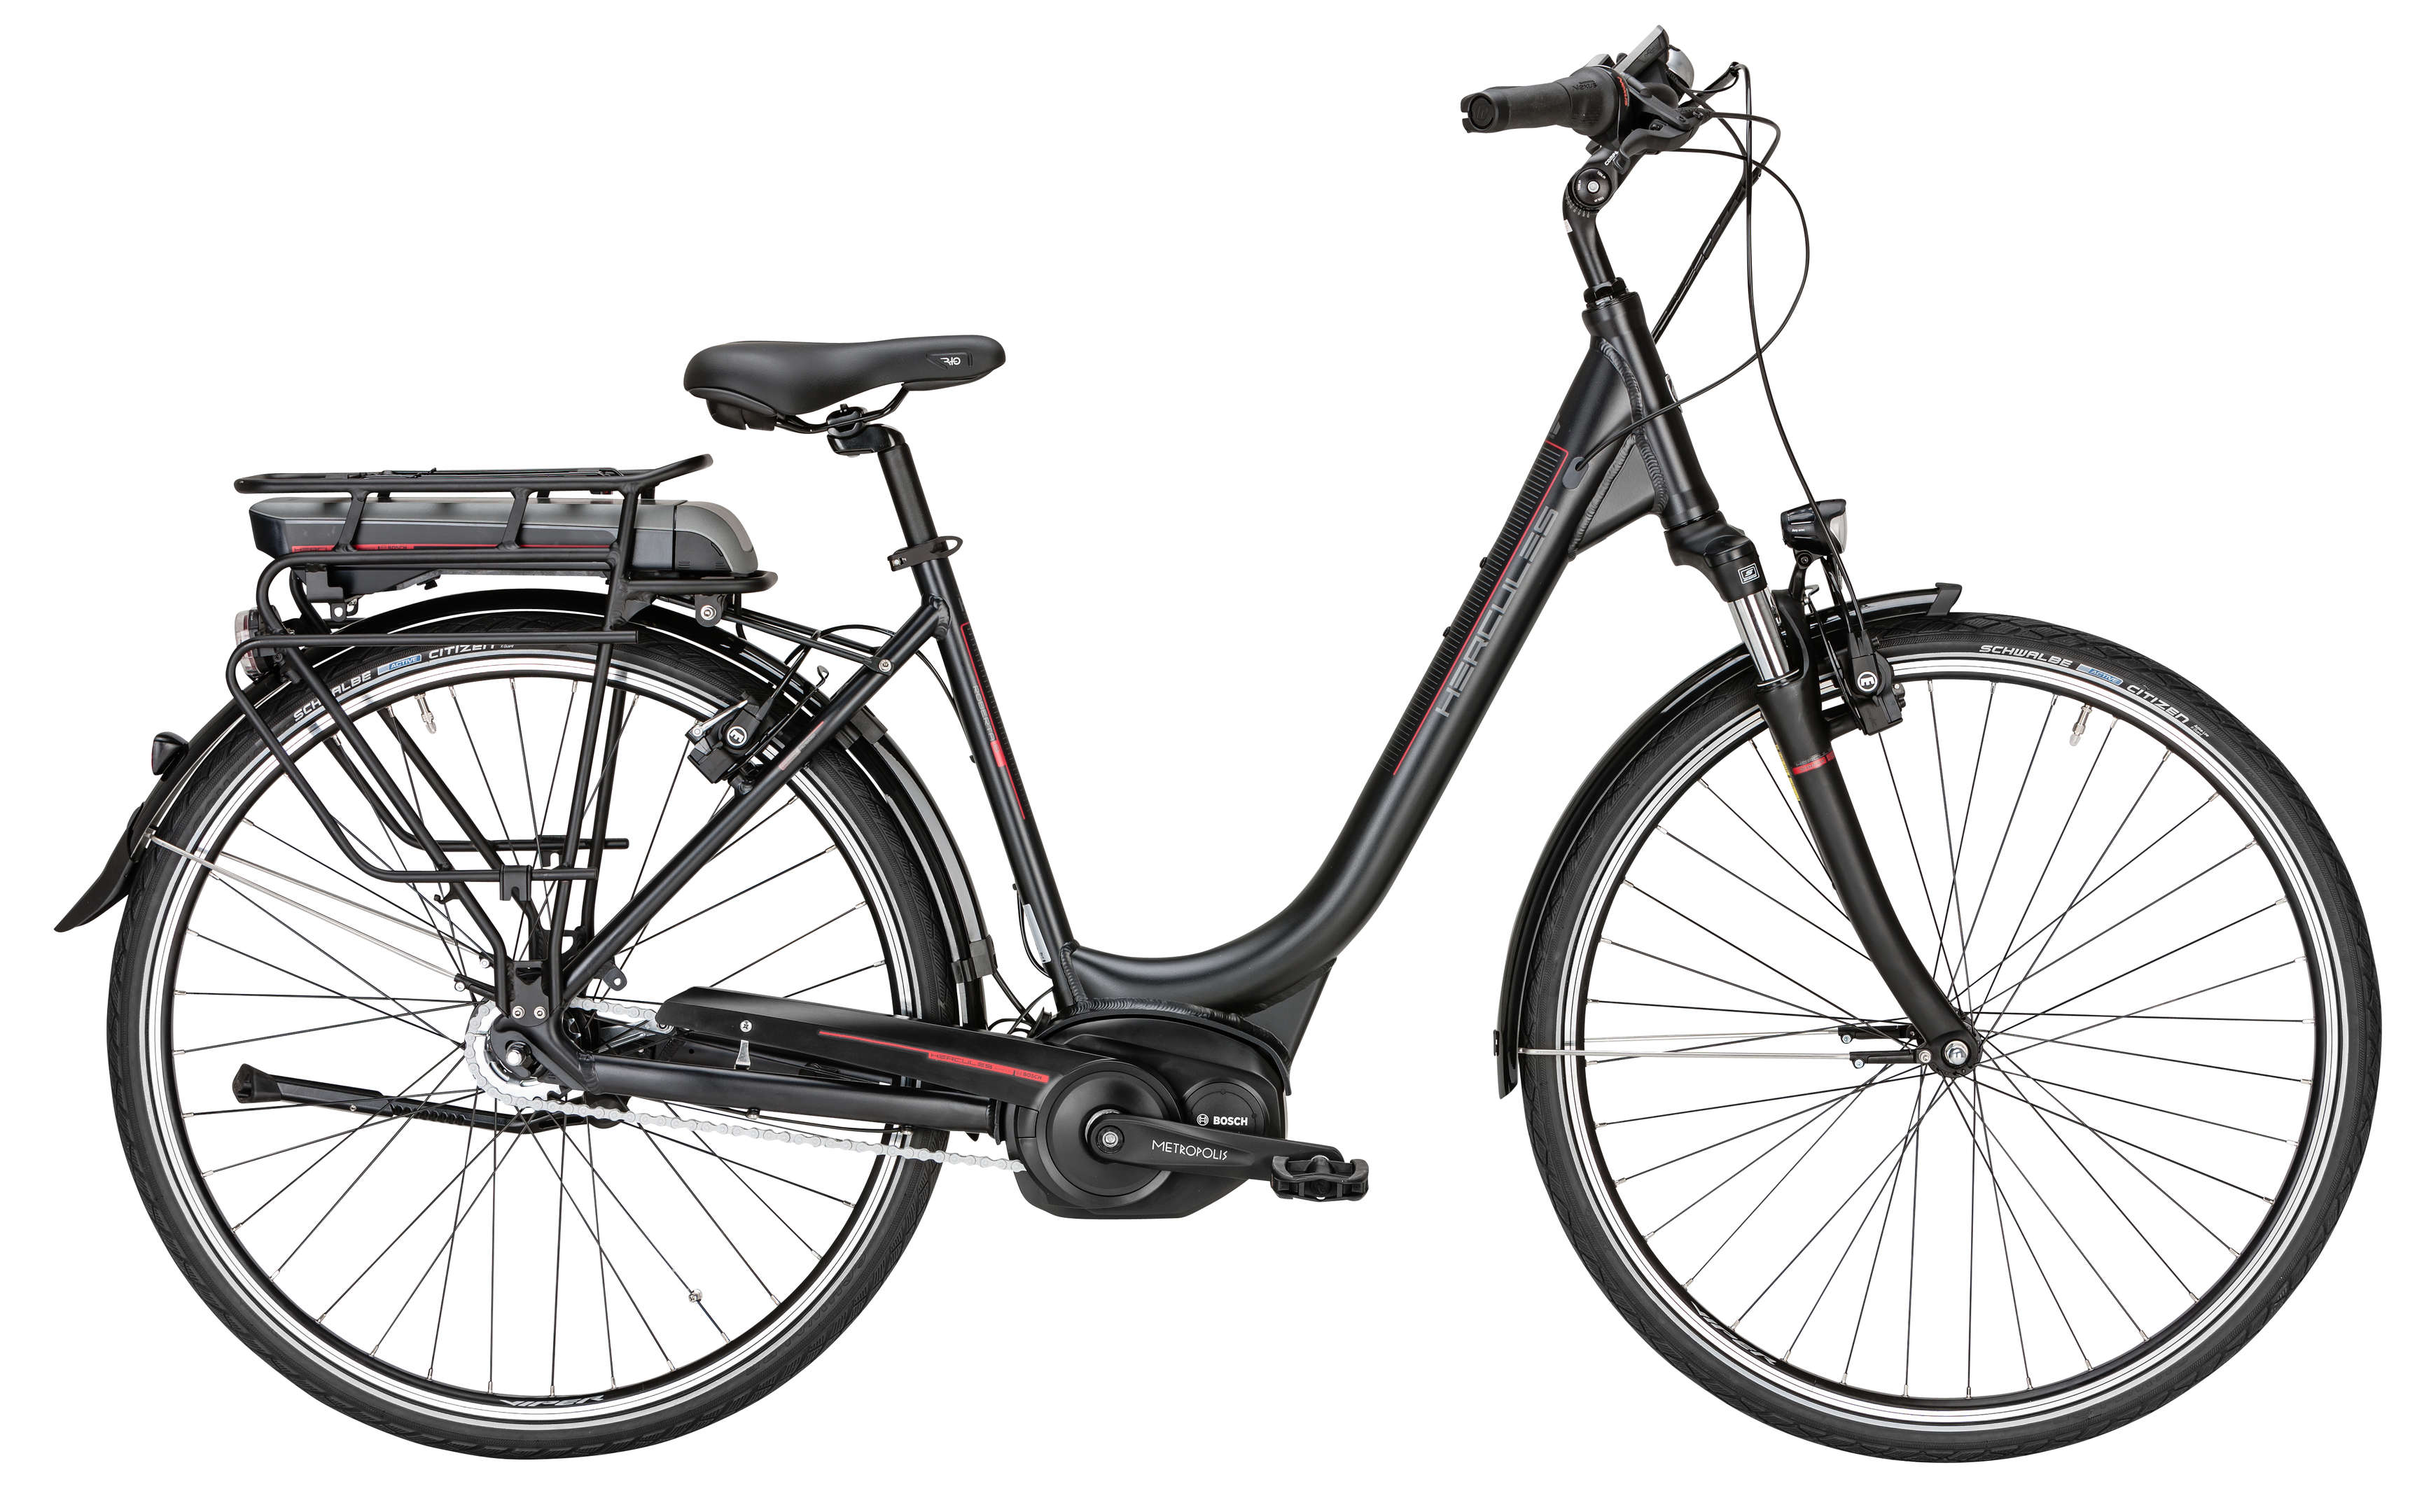 hercules e bike robert a f8 eurorad bikeleasingeurorad. Black Bedroom Furniture Sets. Home Design Ideas